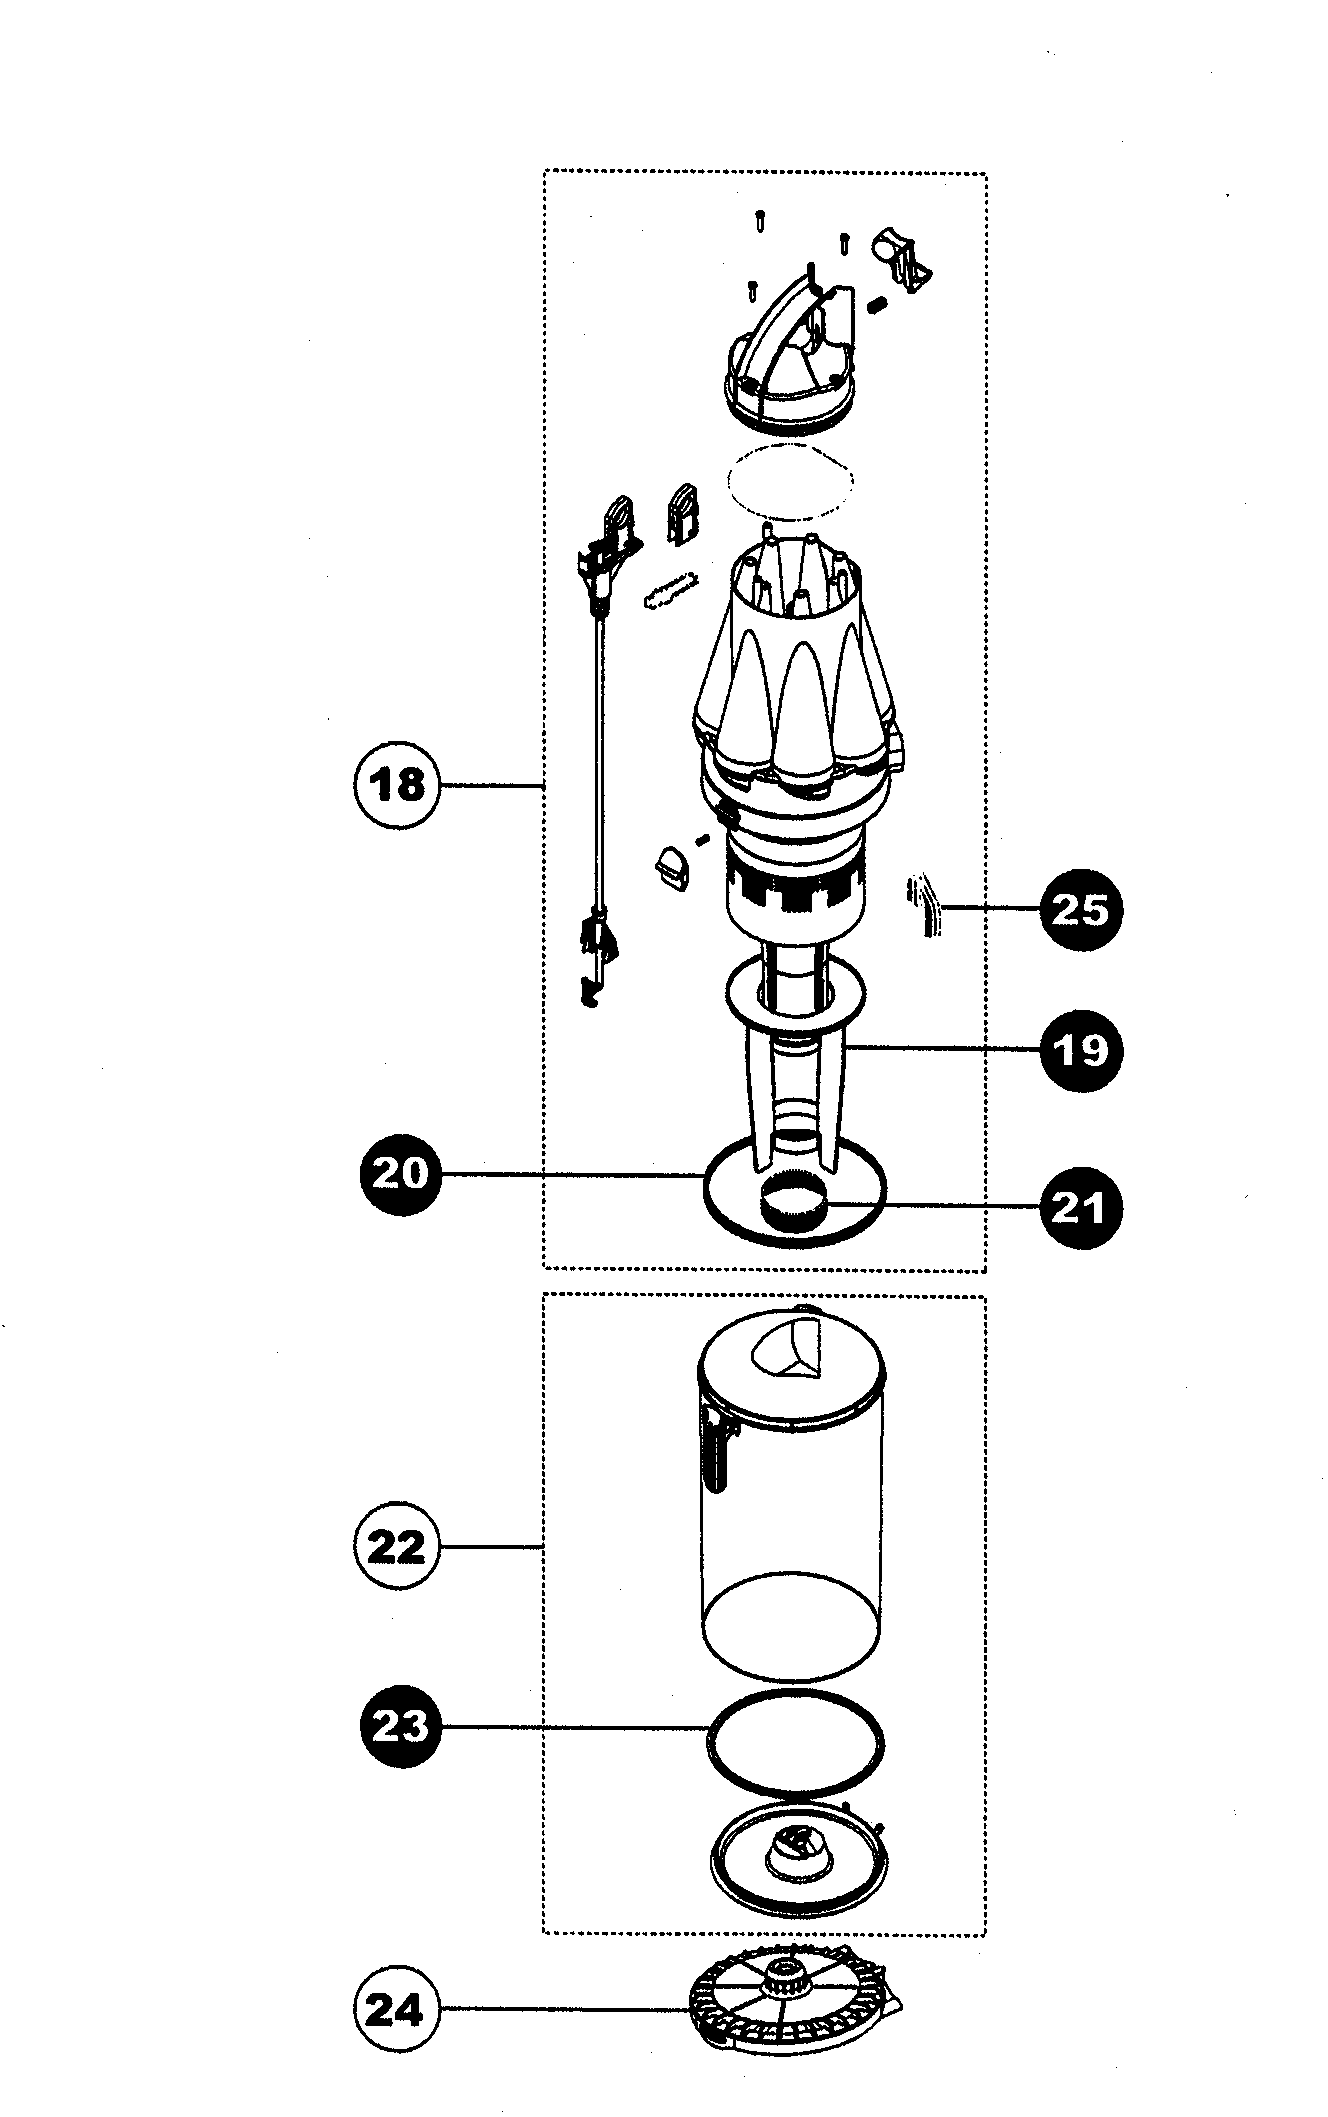 dyson dc17 animal parts diagram bennett trim tab wiring dc07 free engine image for